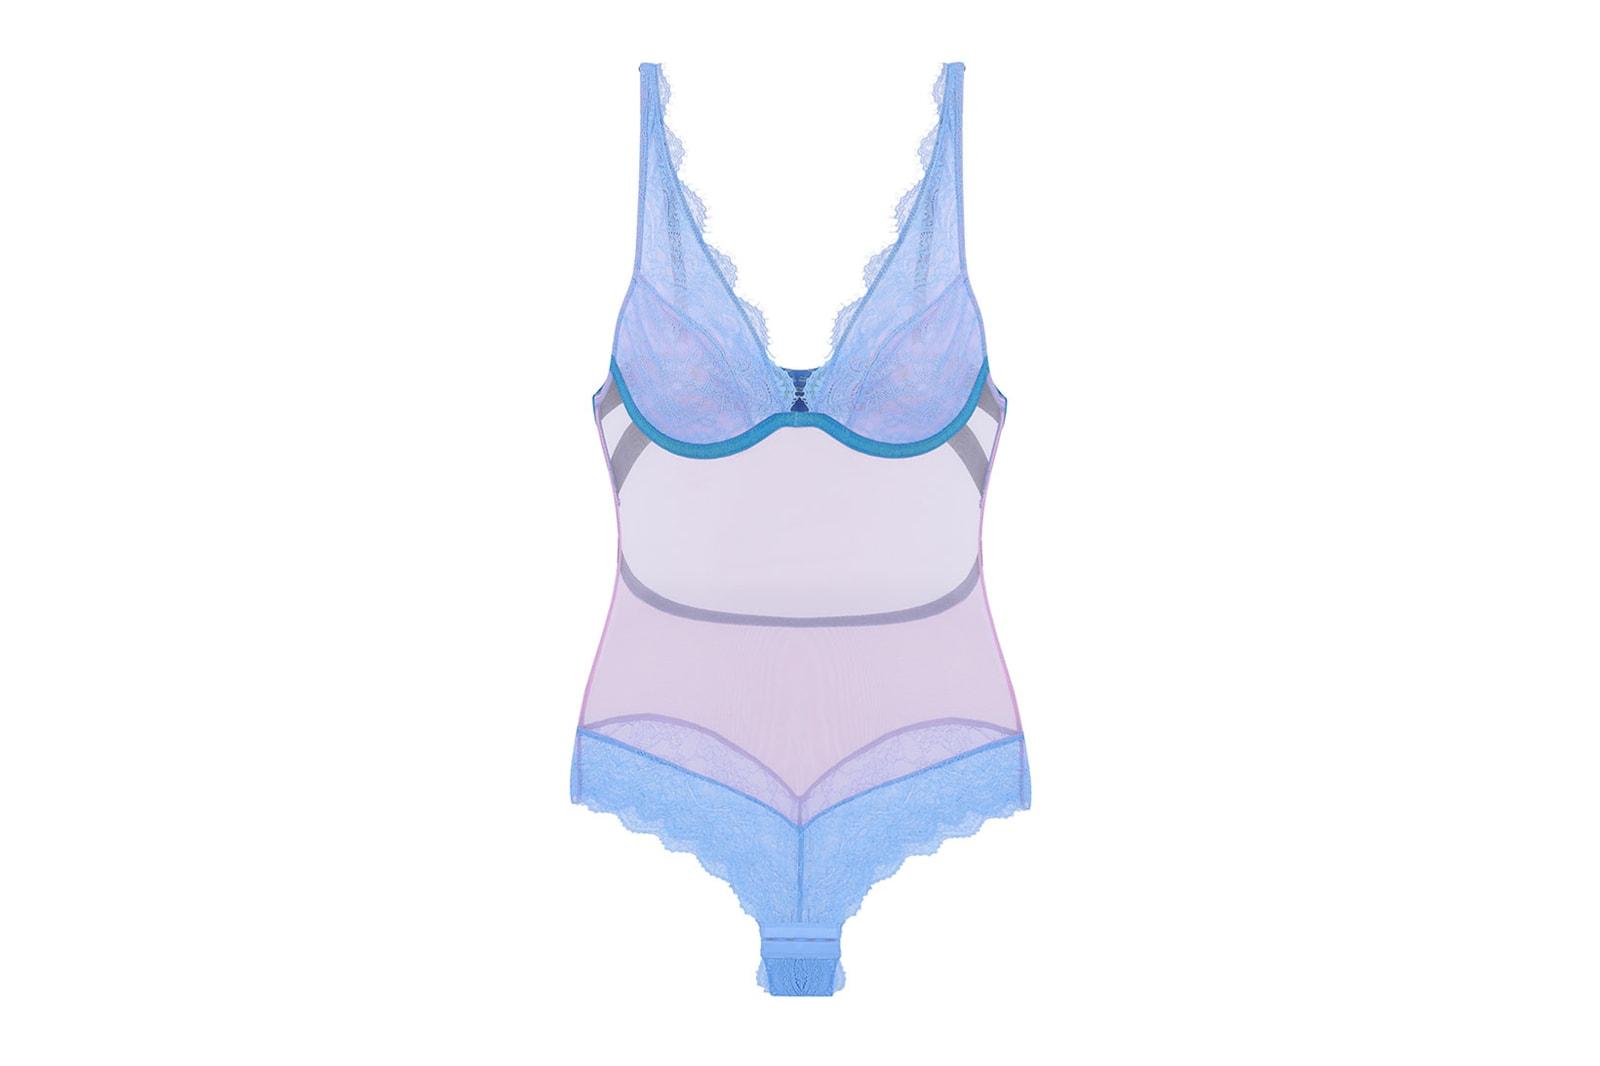 dora larsen lingerie lace bras underwear bodysuits sets sustainable eco-friendly jessica lily release